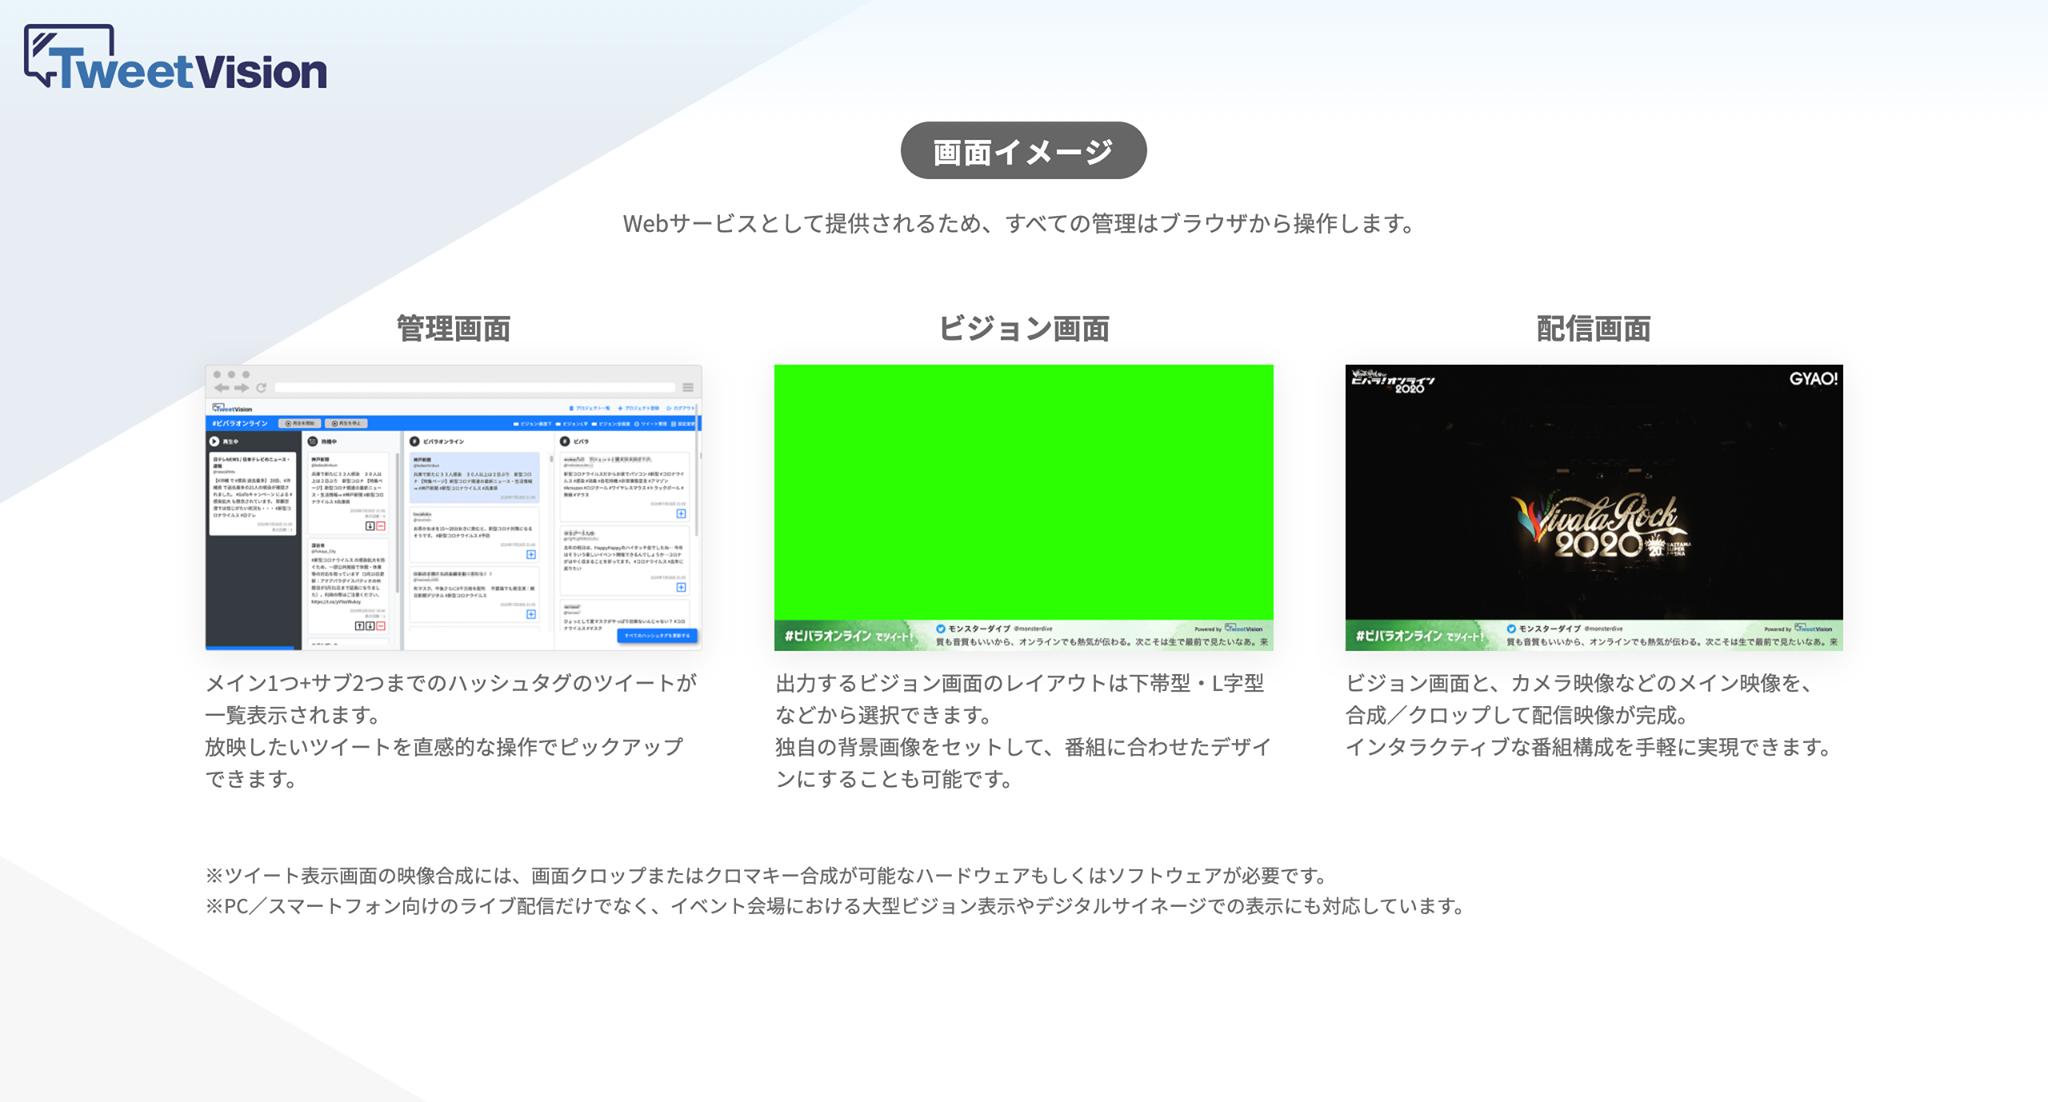 「TweetVision」画面イメージ